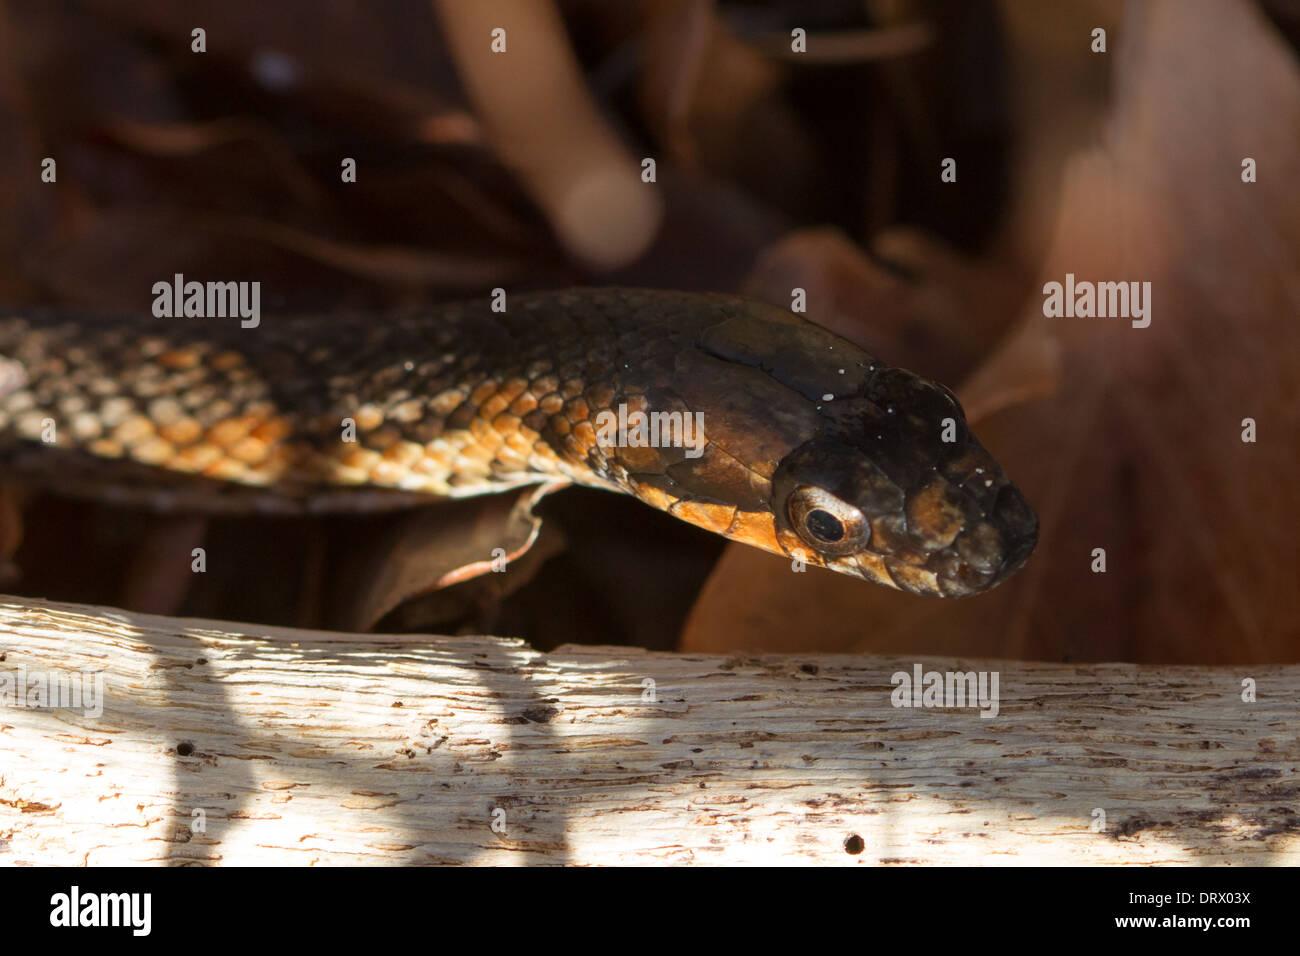 Bimini Brown Racer (Alsophis vudii) - Stock Image